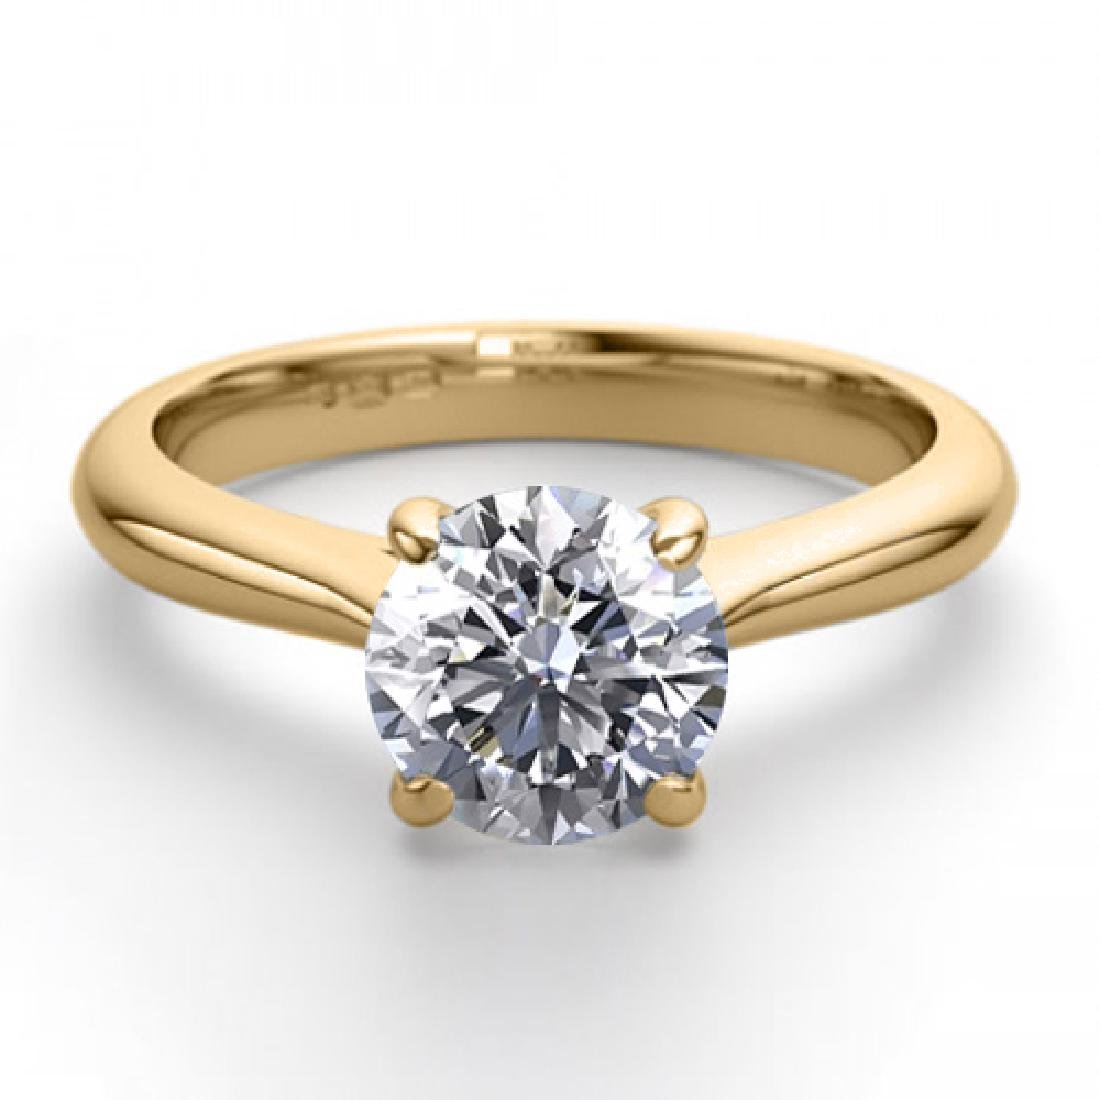 14K Yellow Gold Jewelry 1.36 ctw Natural Diamond